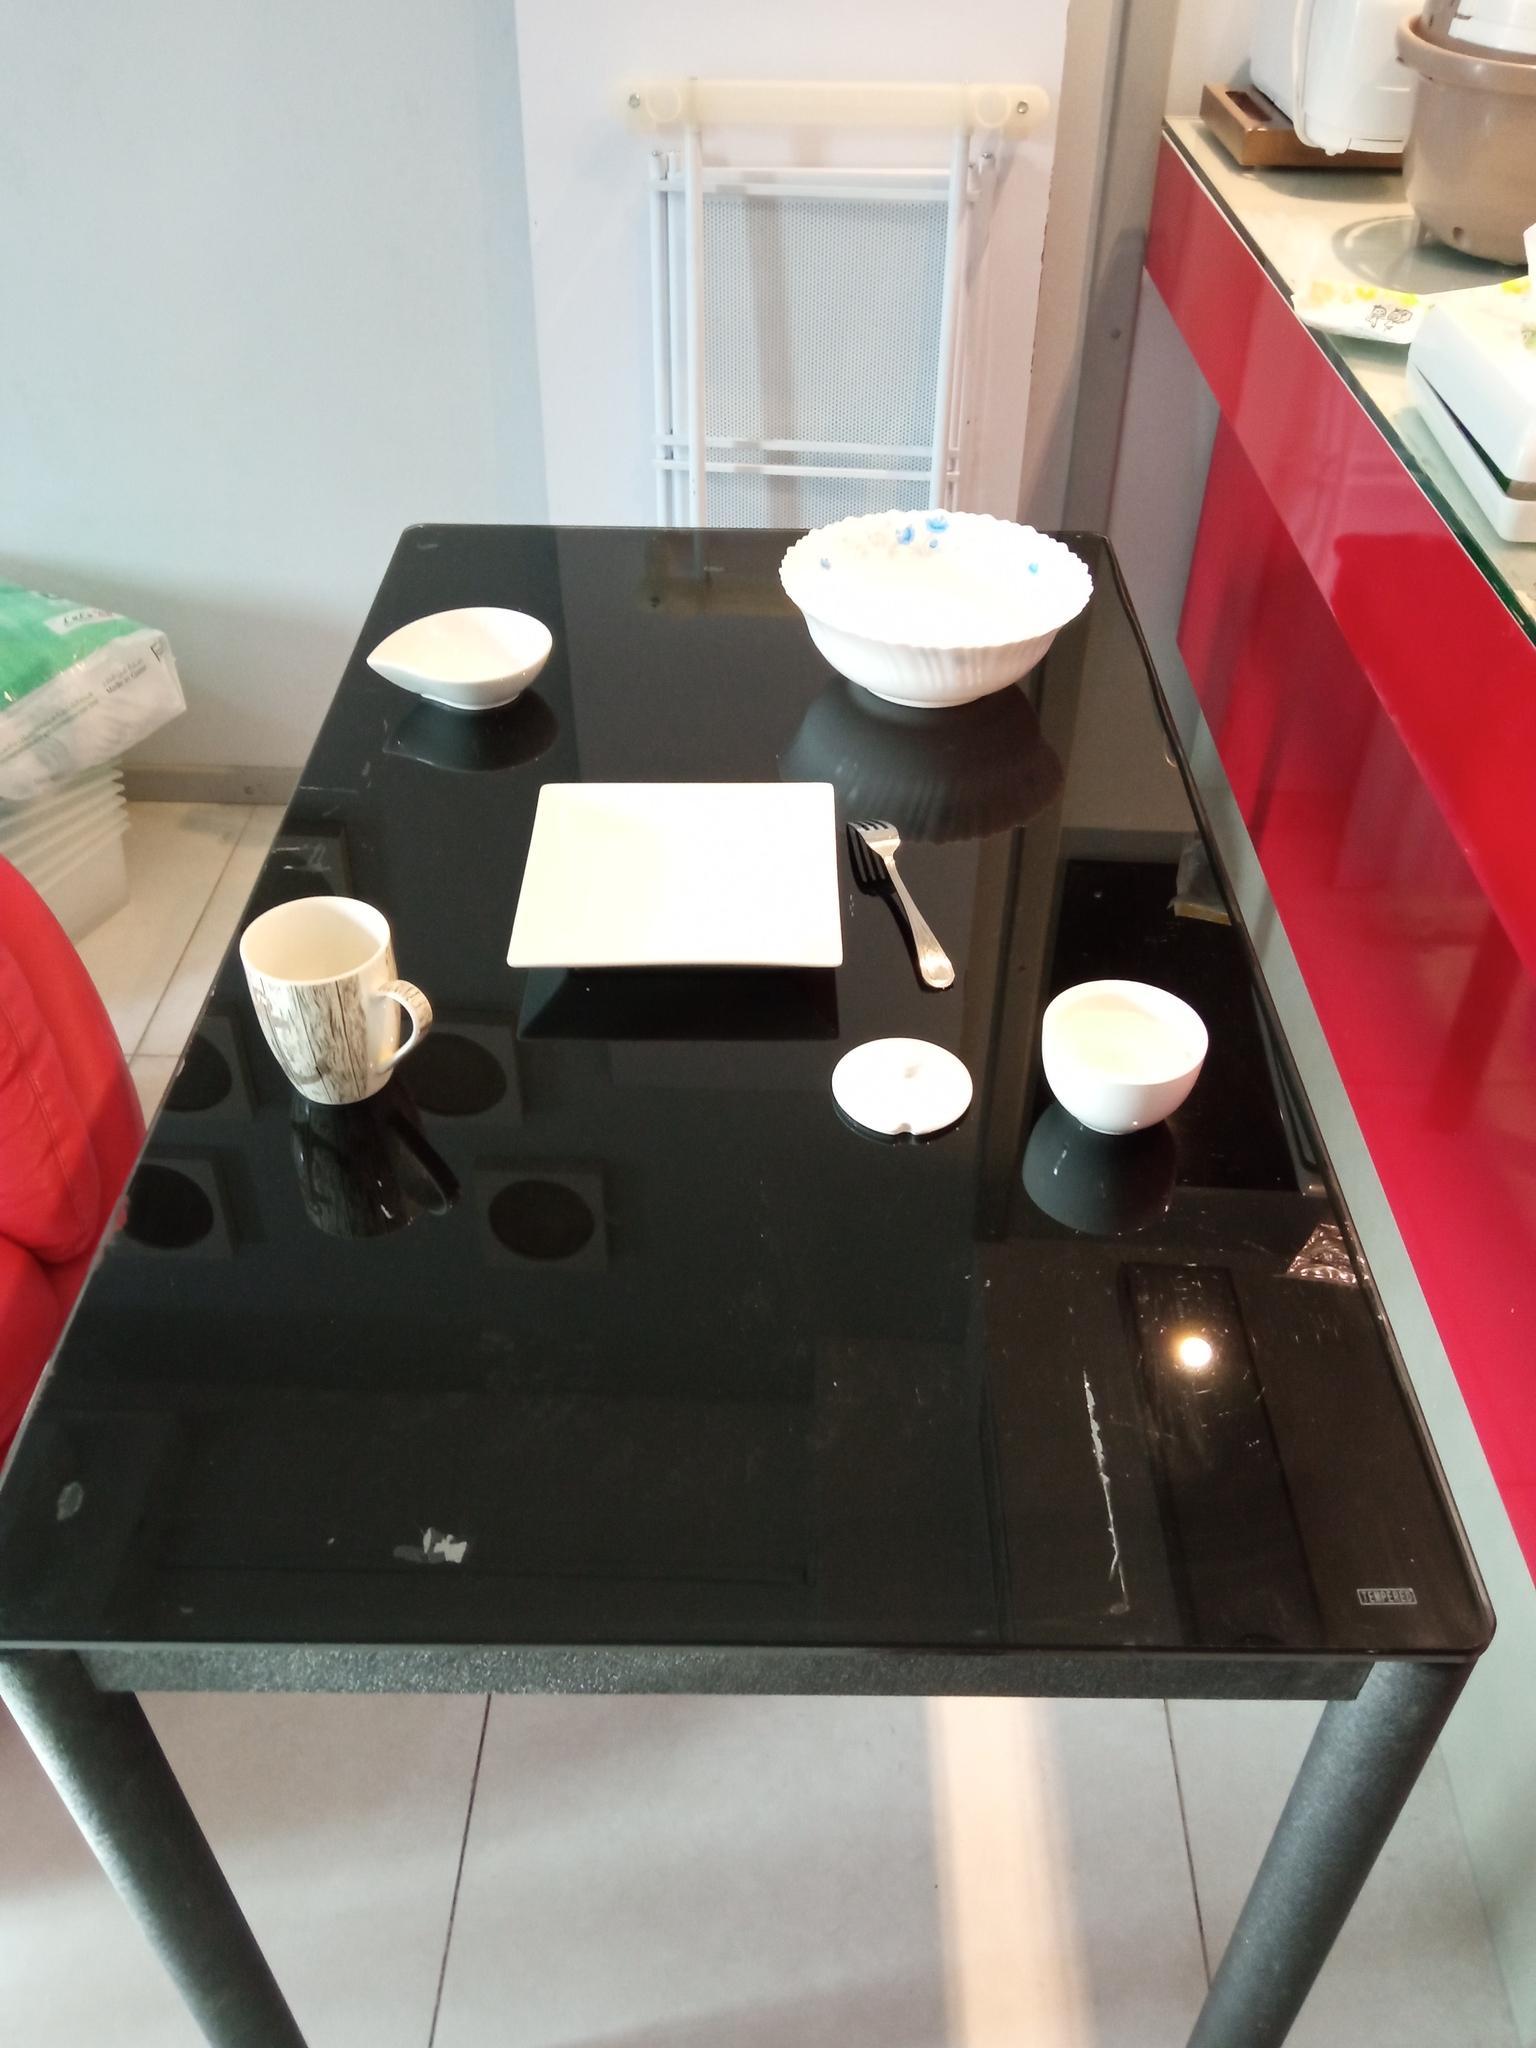 kitchen table.  iron legs, durable glass top.  Siz